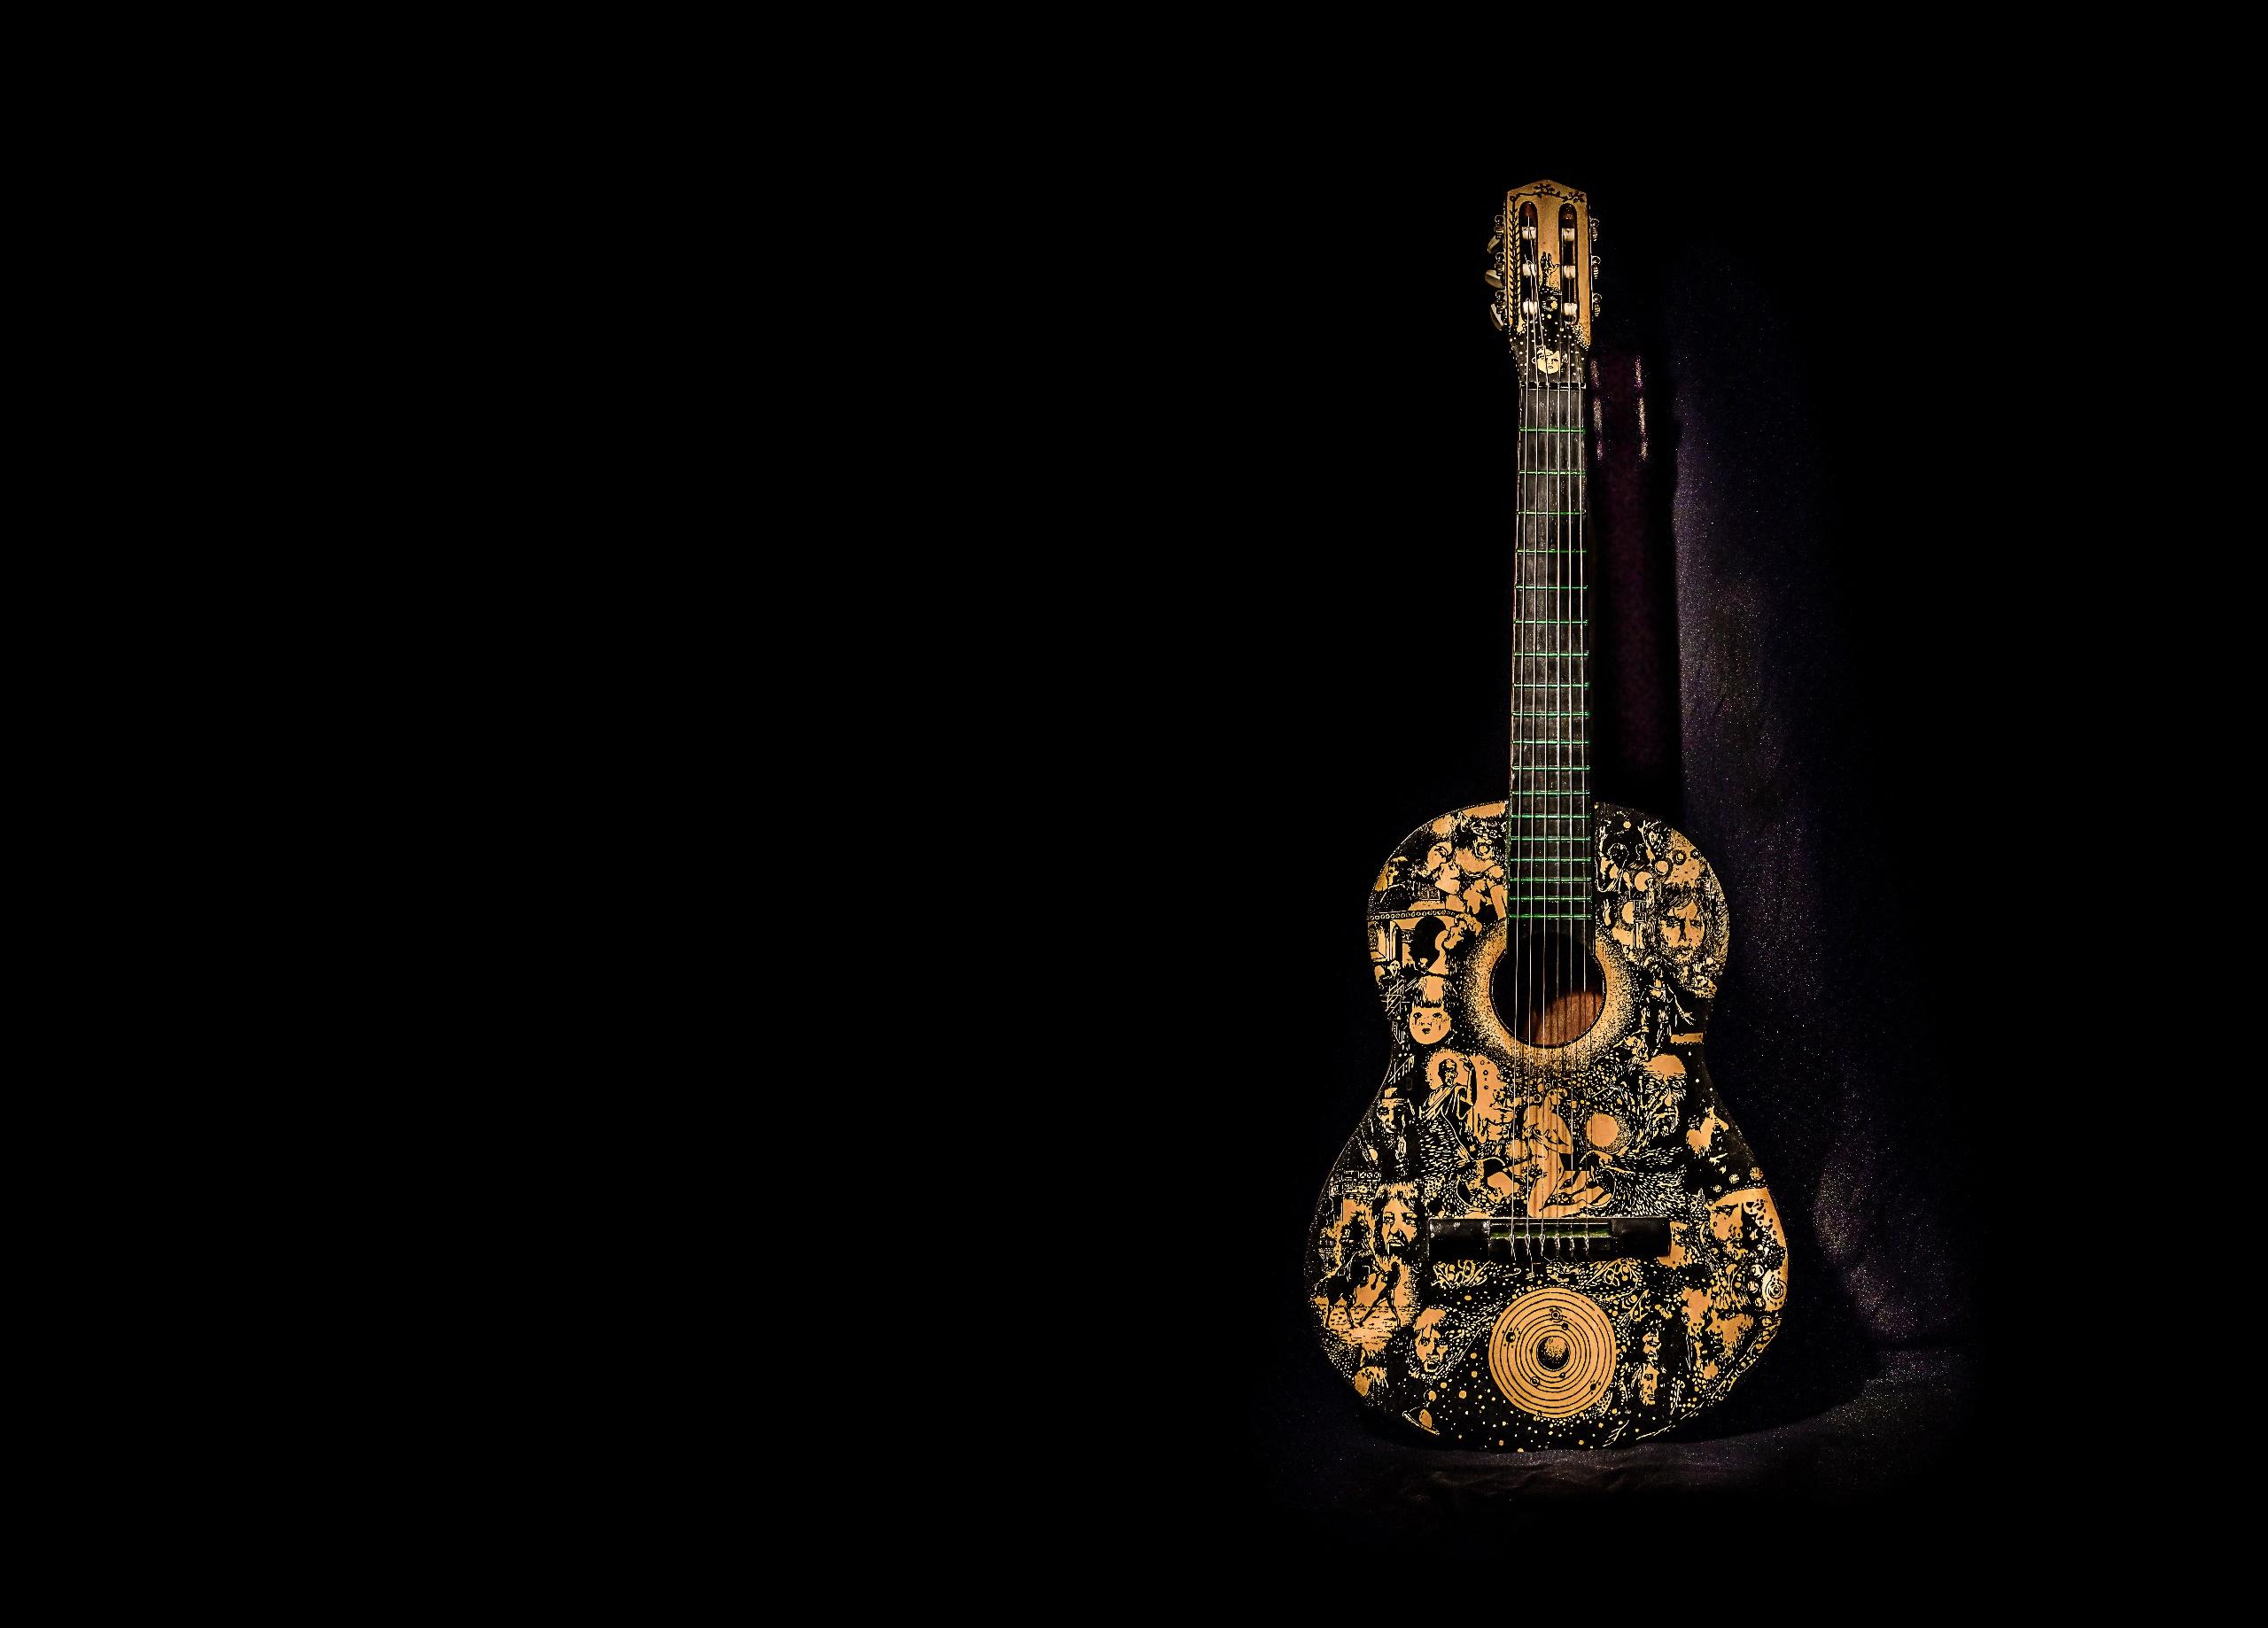 Wallpaper Guitar Simple Background Musical Instrument 2560x1838 Wallpapermaniac 1762353 Hd Wallpapers Wallhere